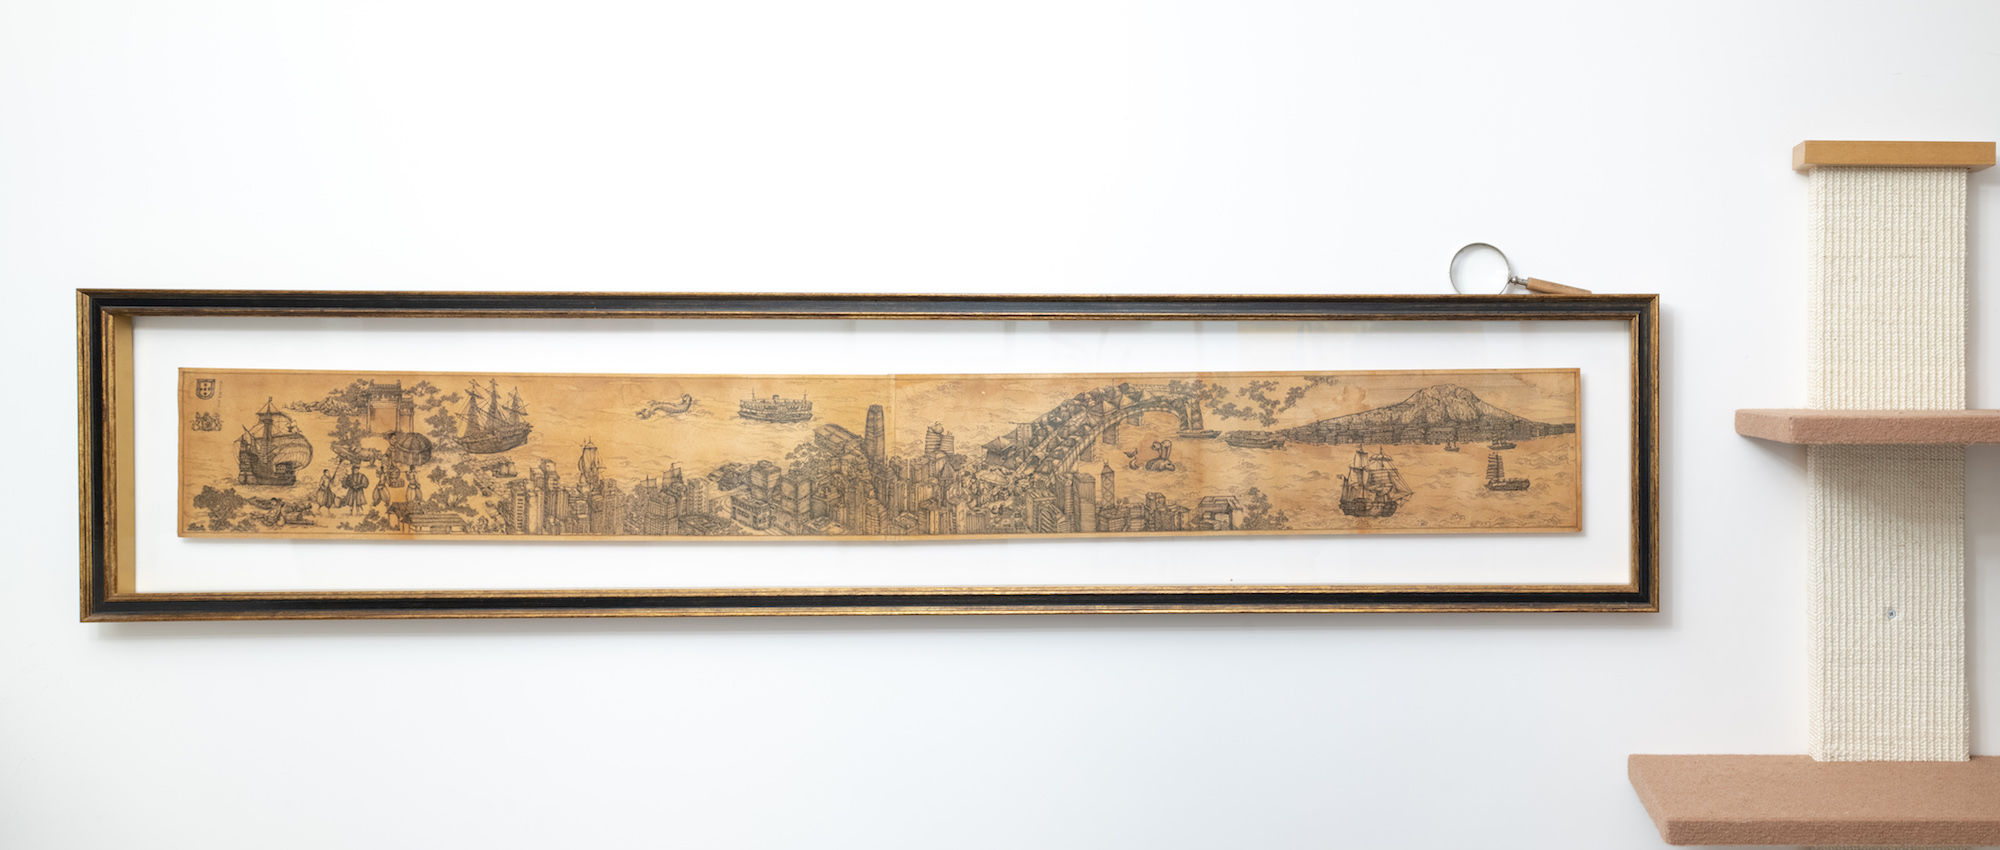 """Paradise: Hong Kong"" hanging in the living room. Courtesy of Yuri van der Leest."